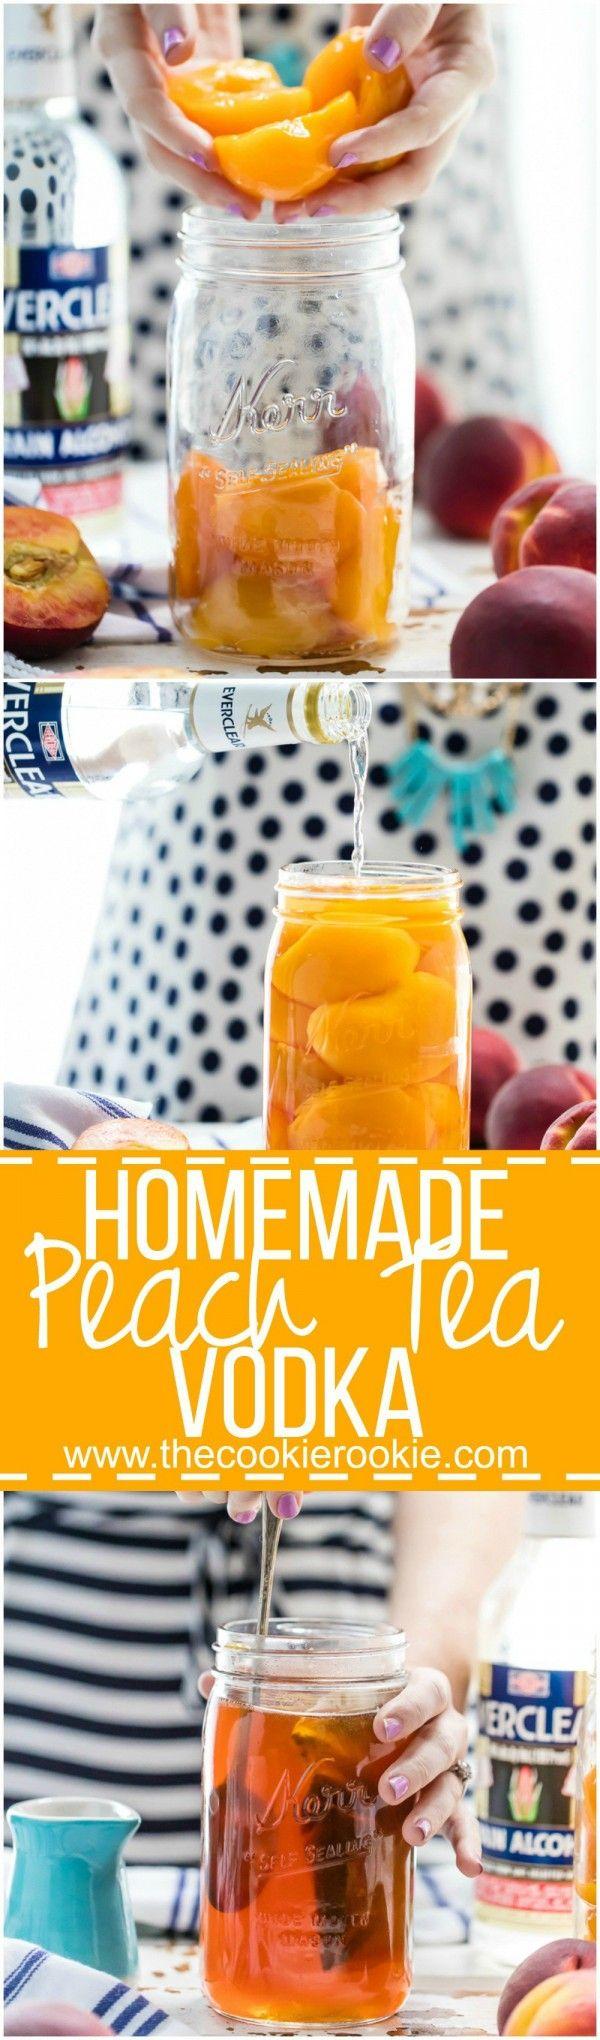 spiked arnold palmer with homemade peach tea vodka pinterest